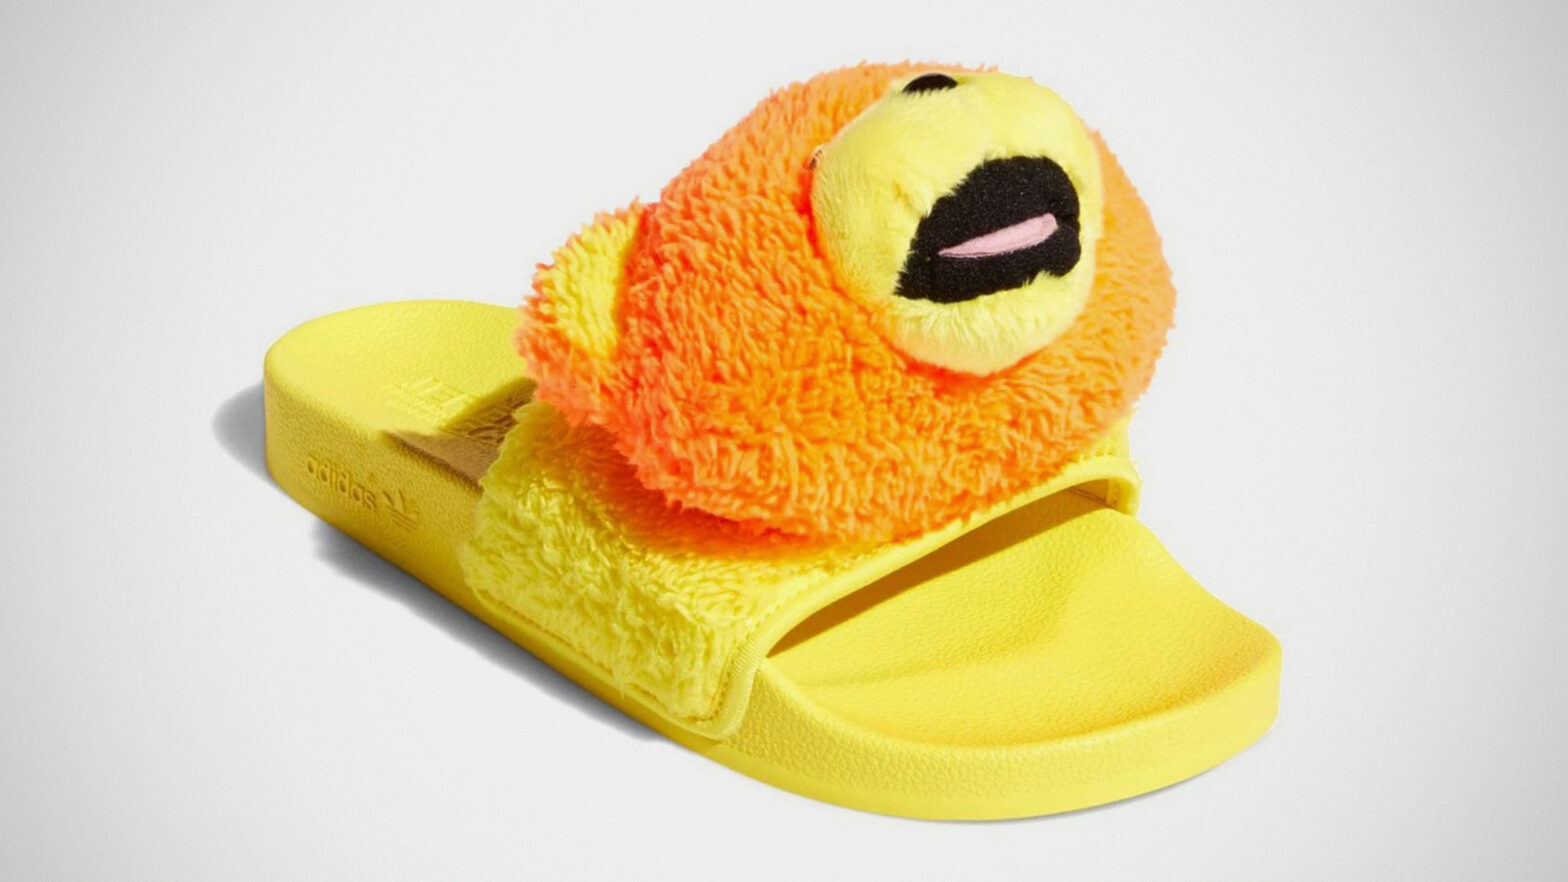 Jeremy Scott's Teddy Bear adidas Slides